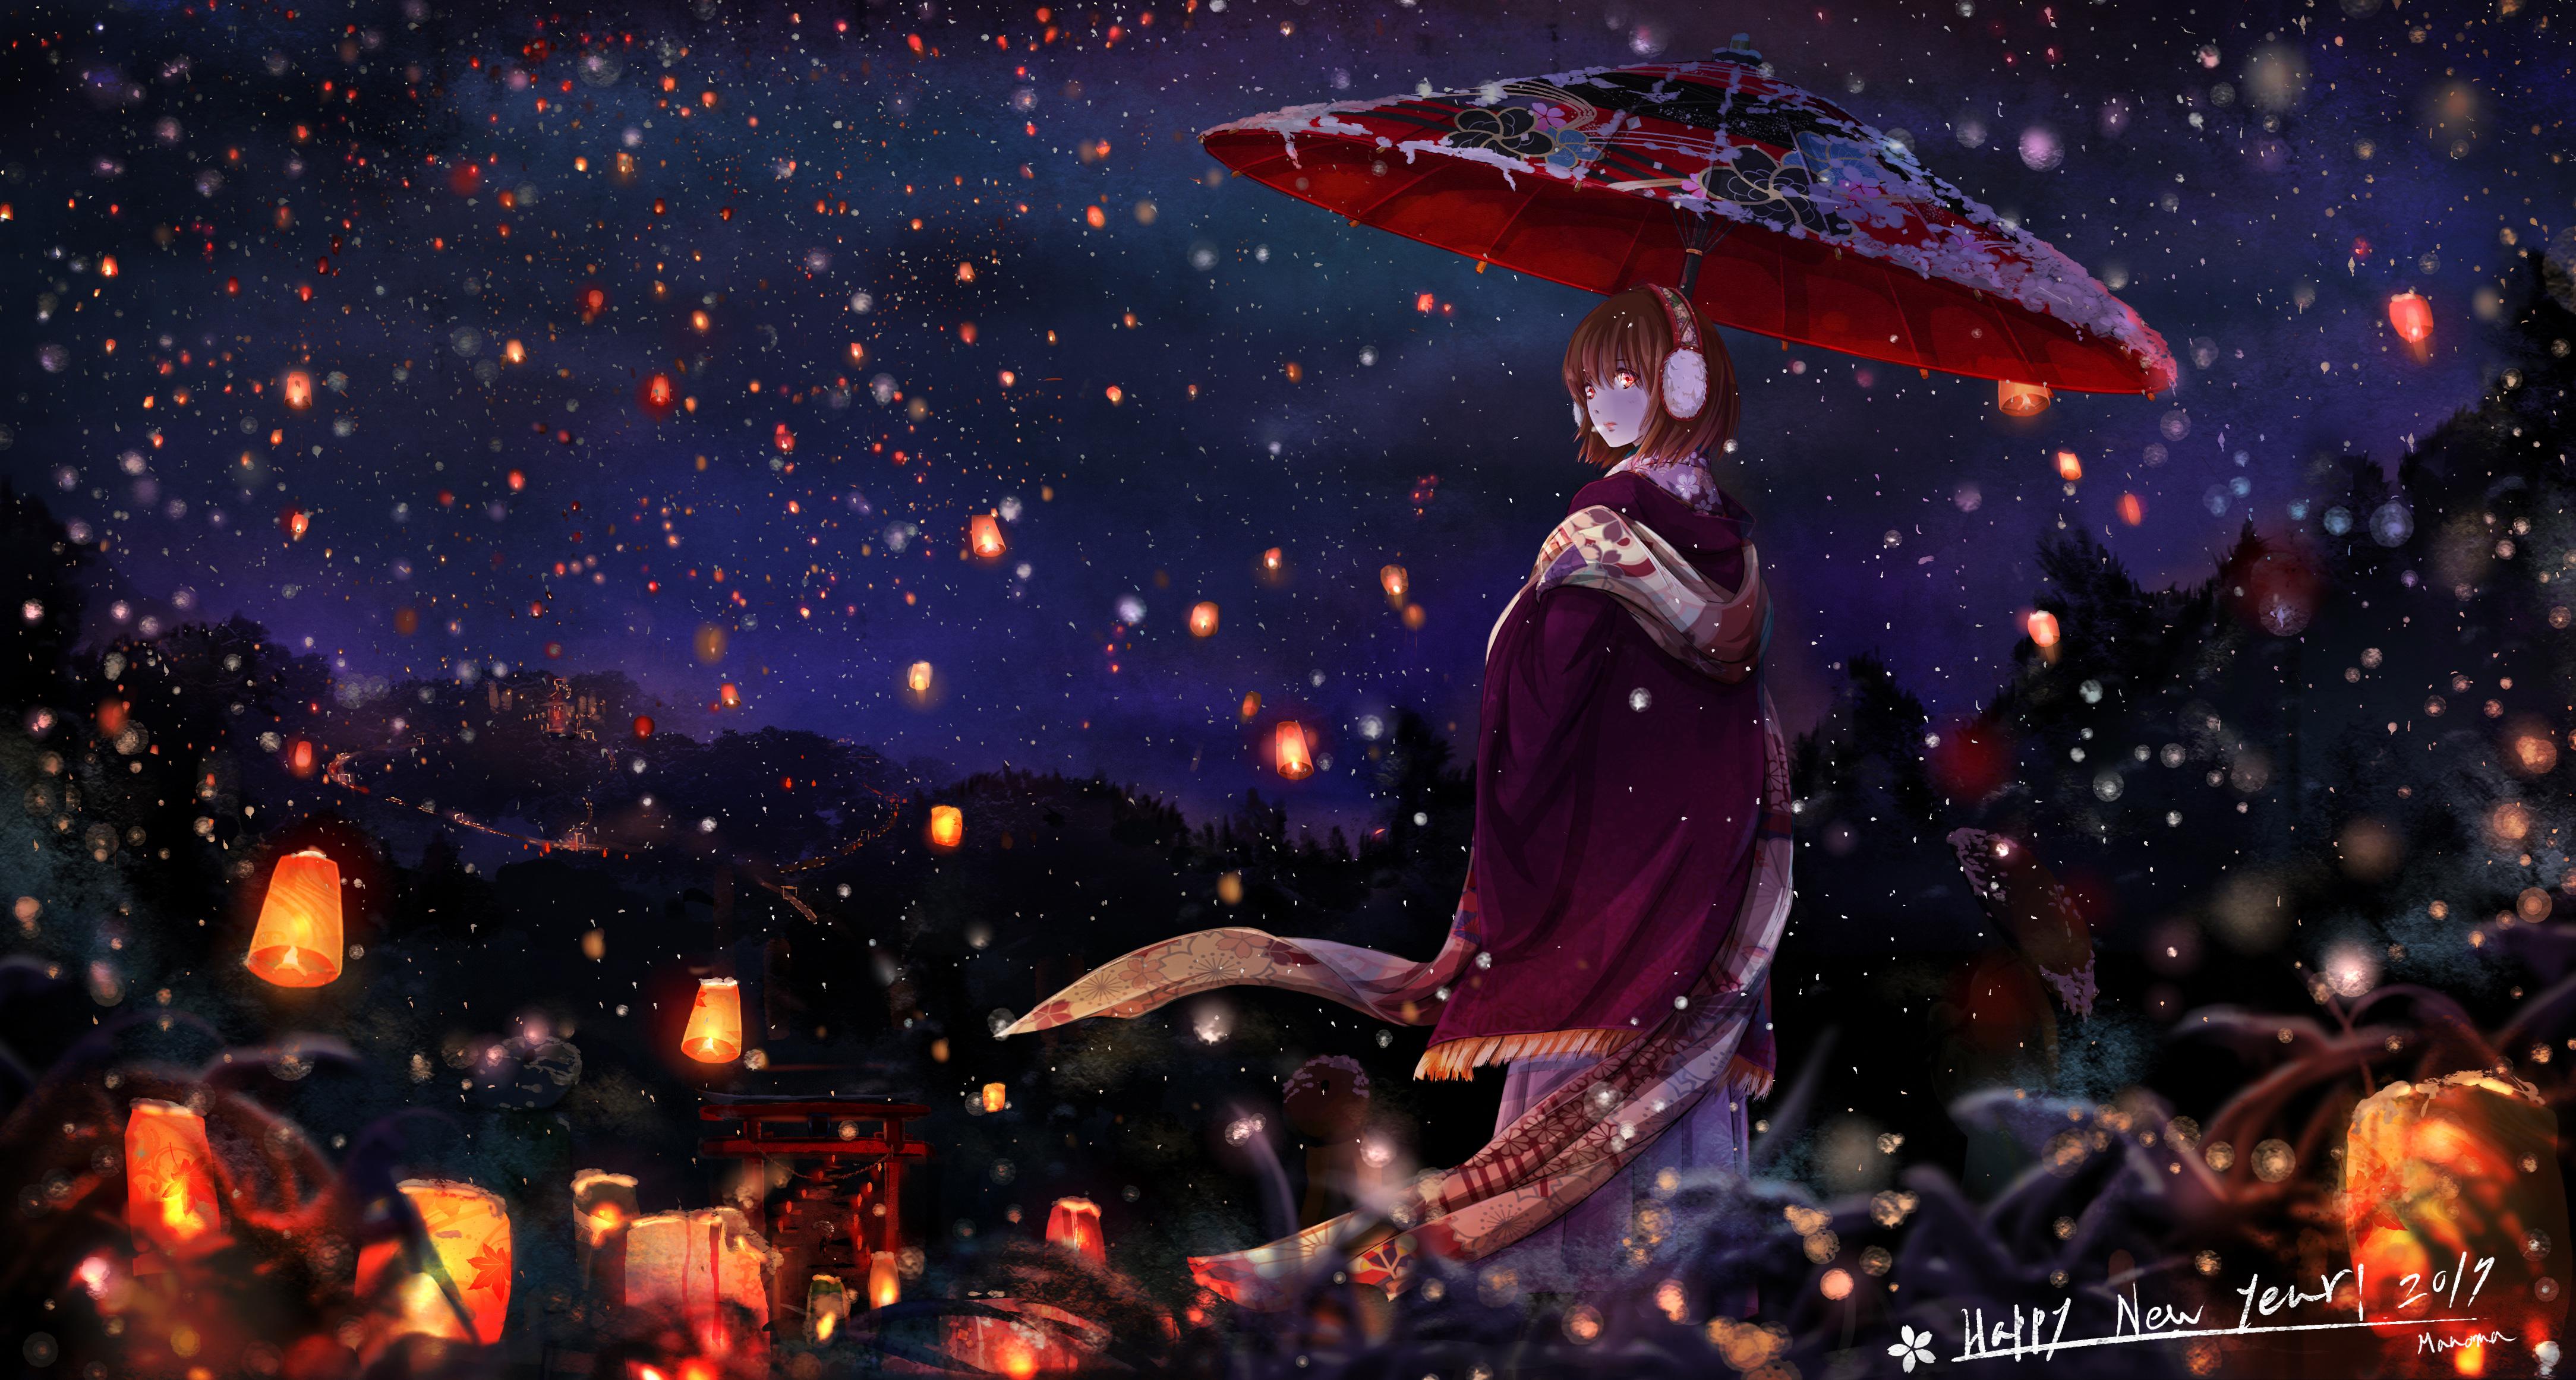 2048x2048 Anime Girl With Umbrella Ipad Air HD 4k ...